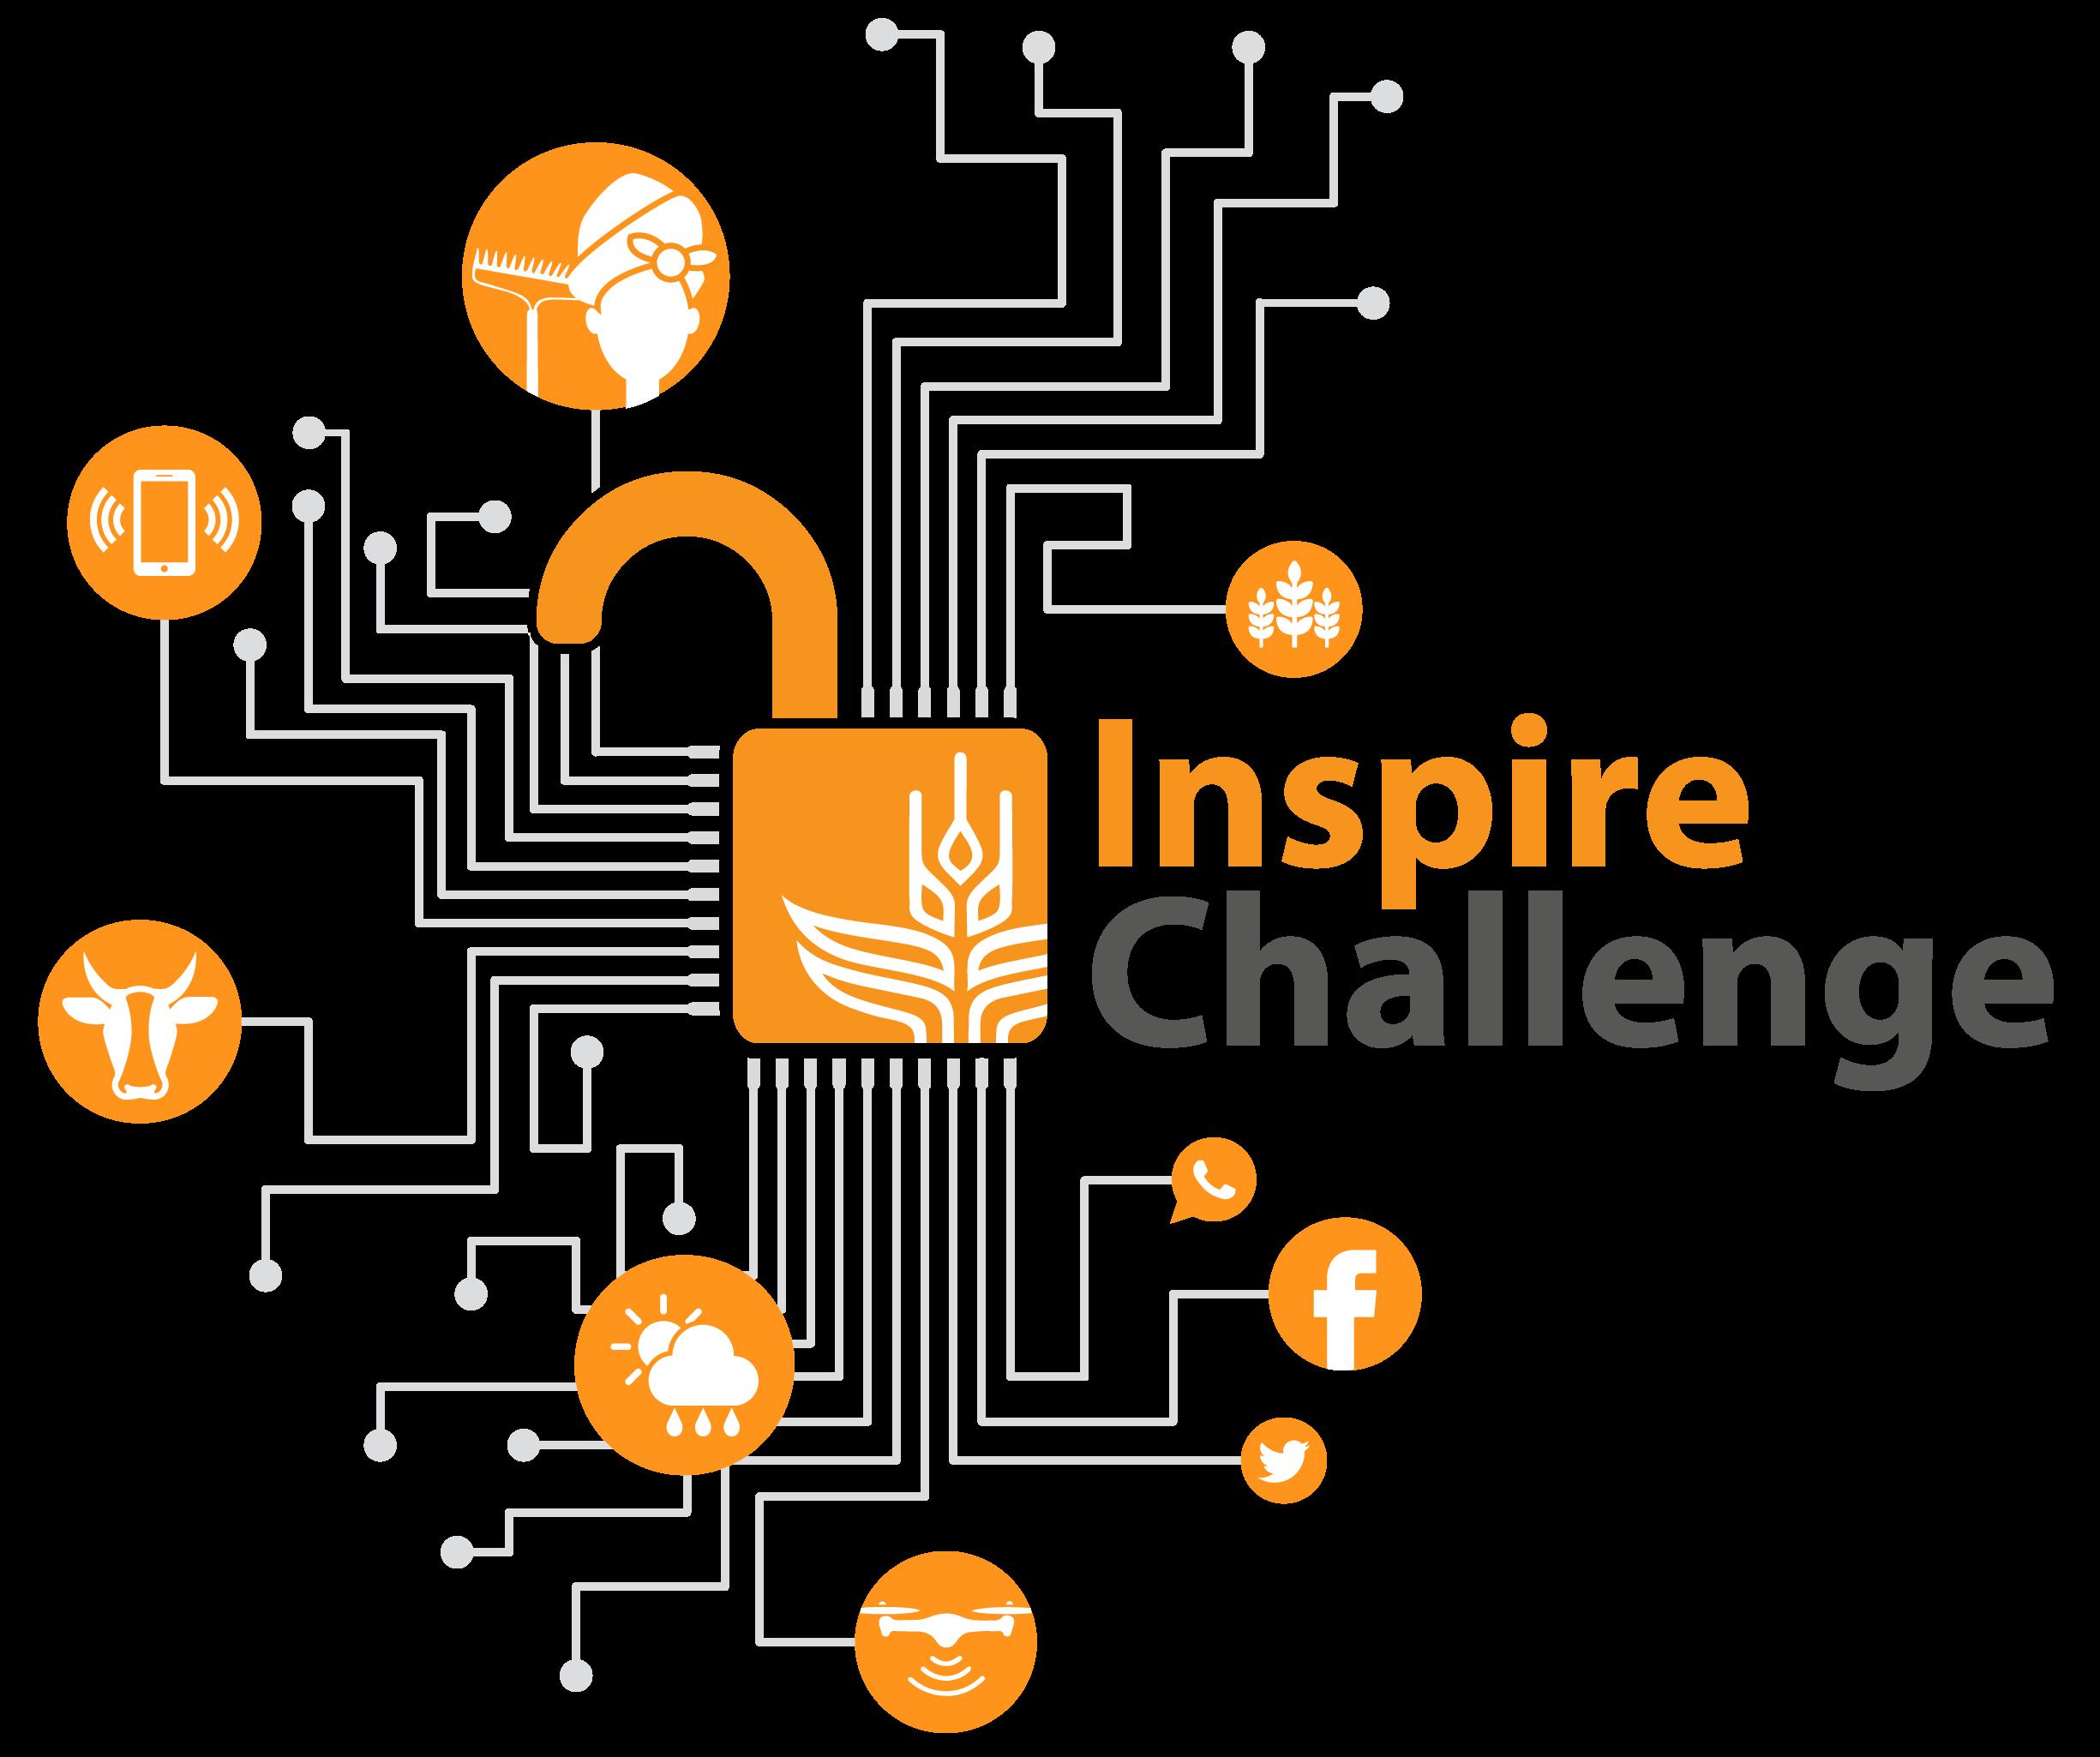 Inspire-Challenge-design-1